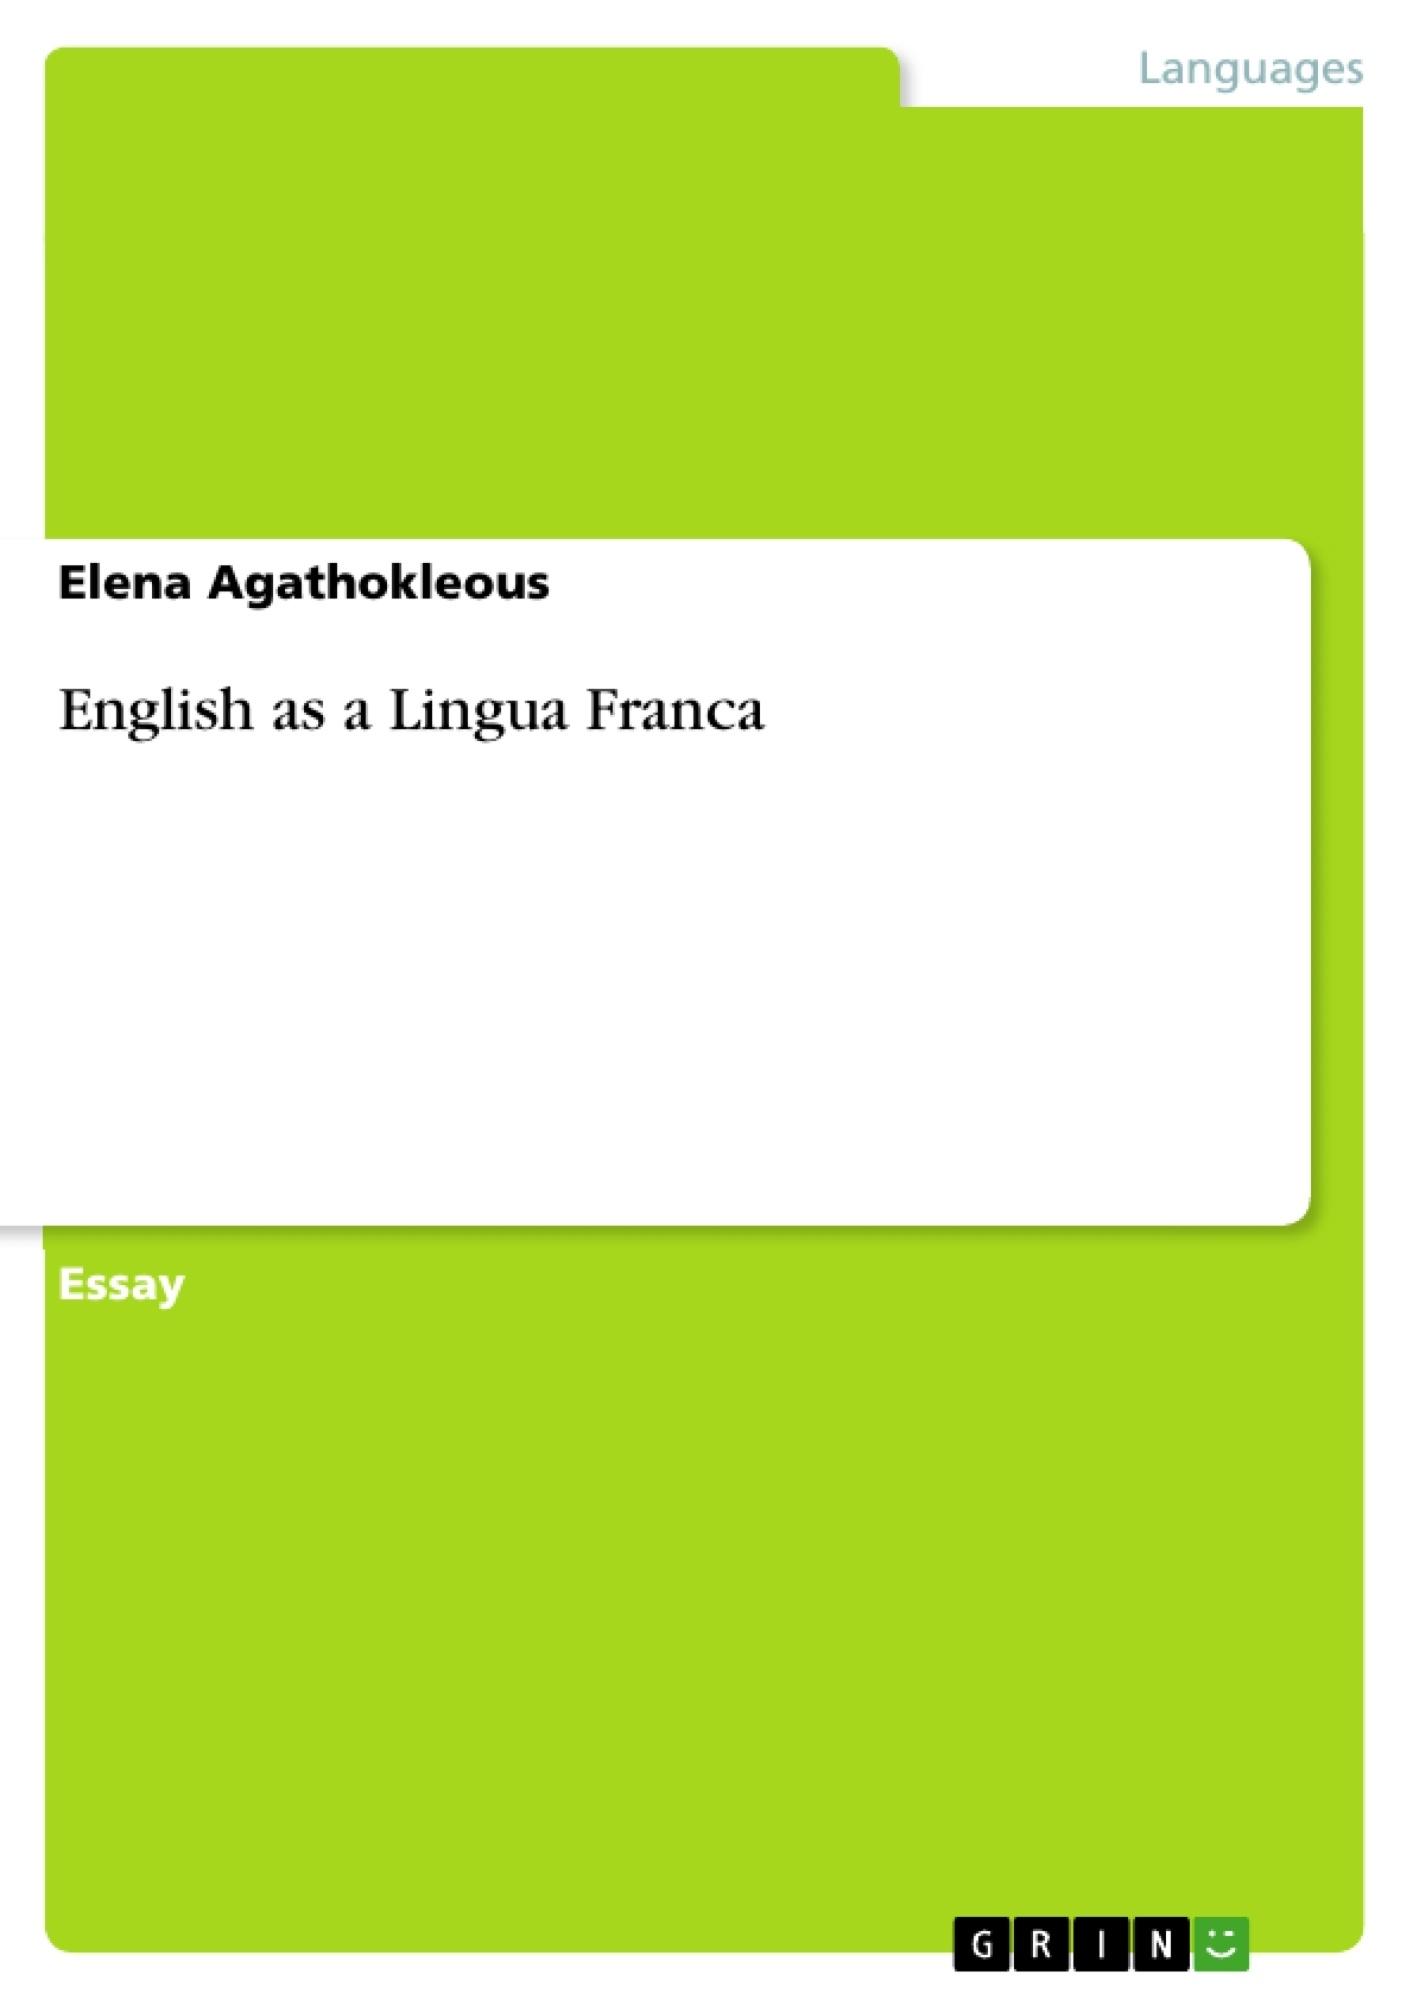 Title: English as a Lingua Franca